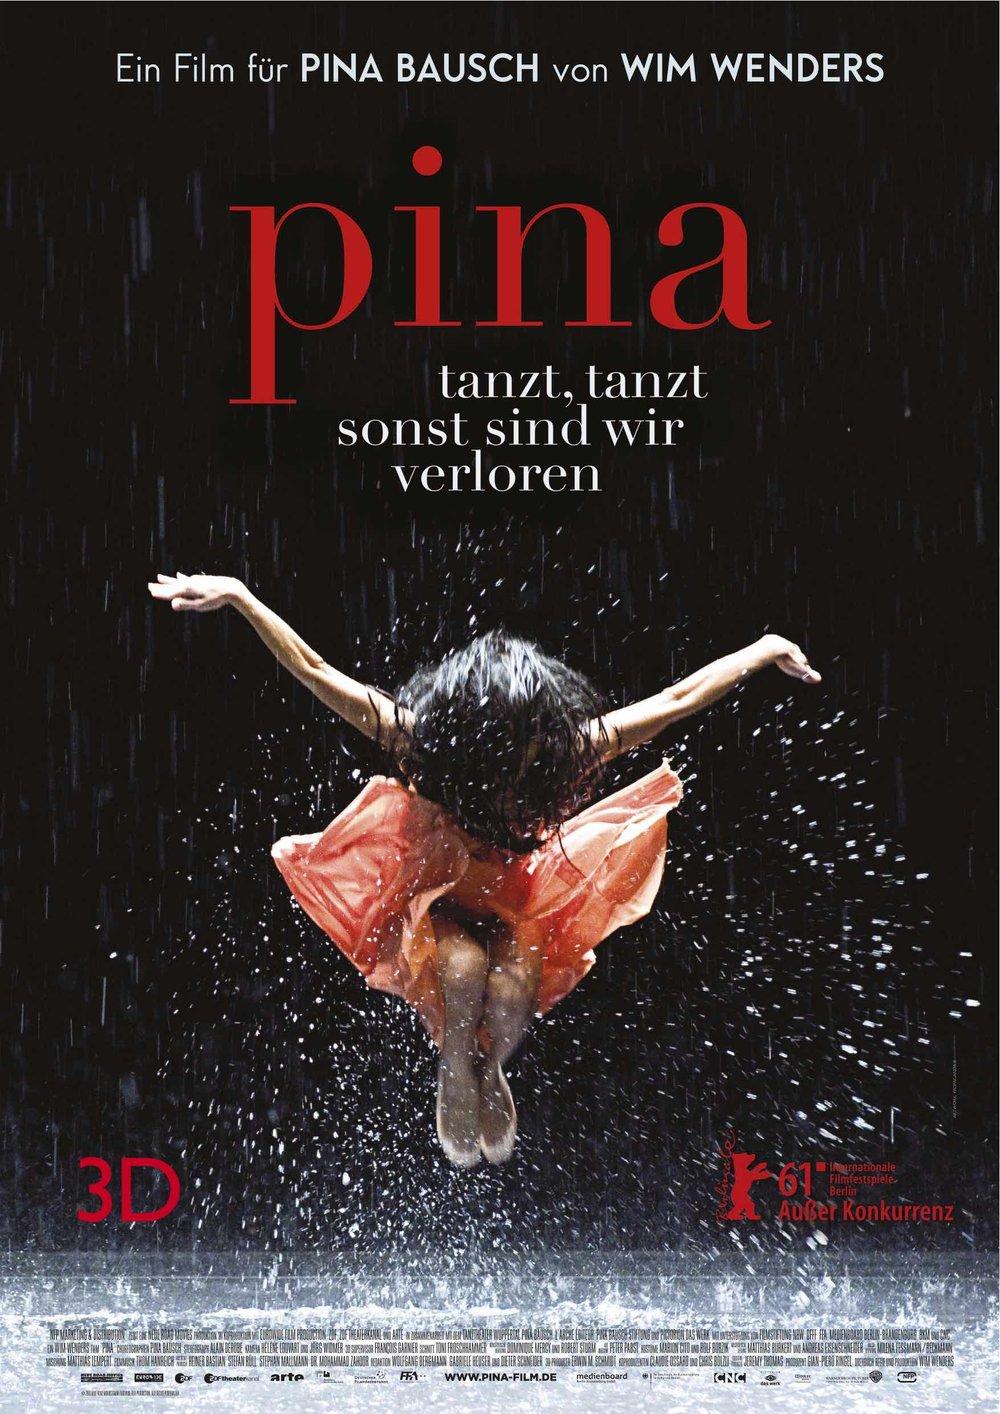 8. PINA_Poster final mit 3D Kopie 2.jpg